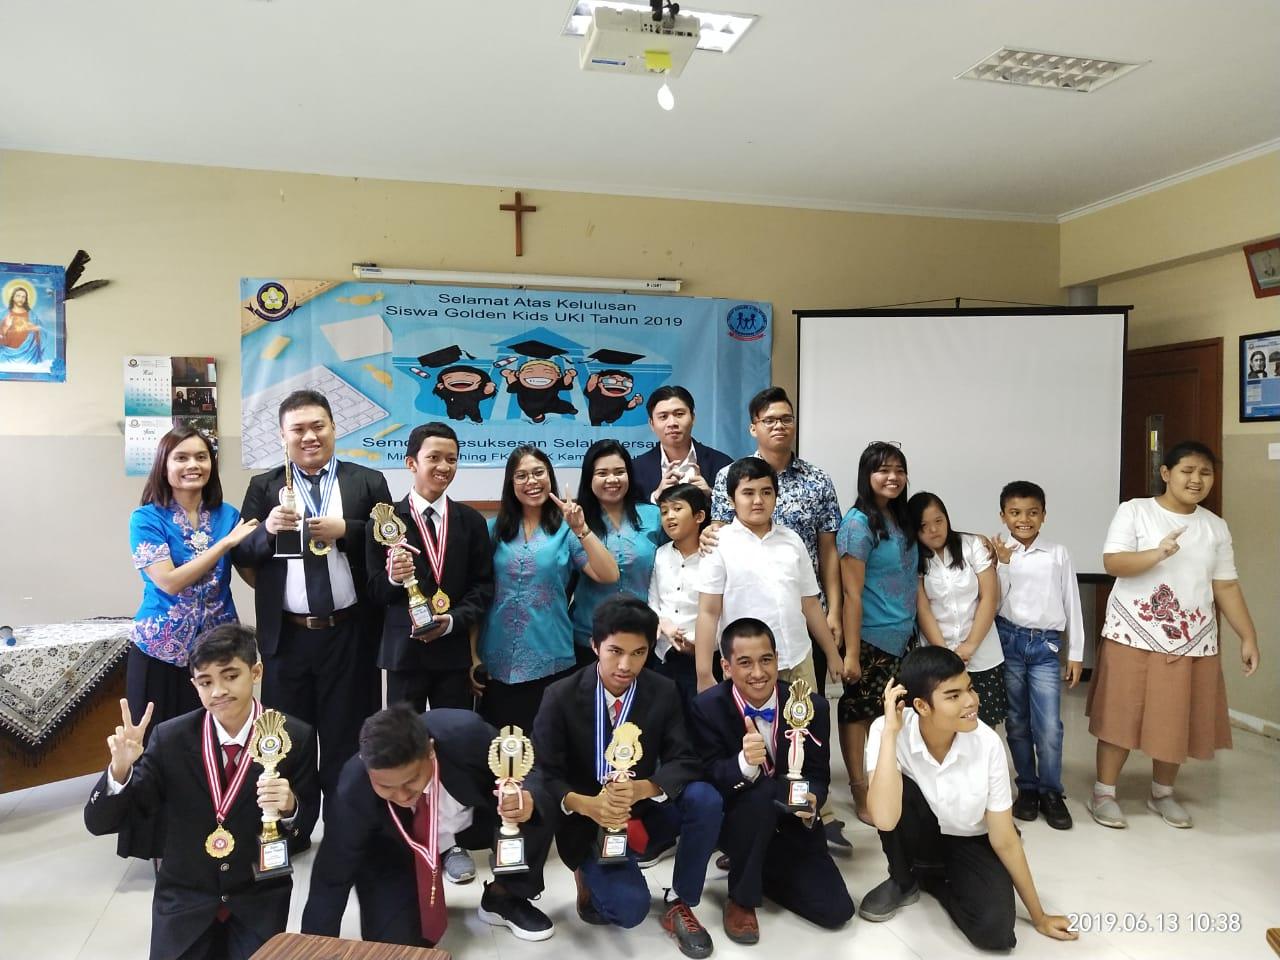 Graduation siswa Golden Kids Program Studi Bimbingan dan Konseling UKI